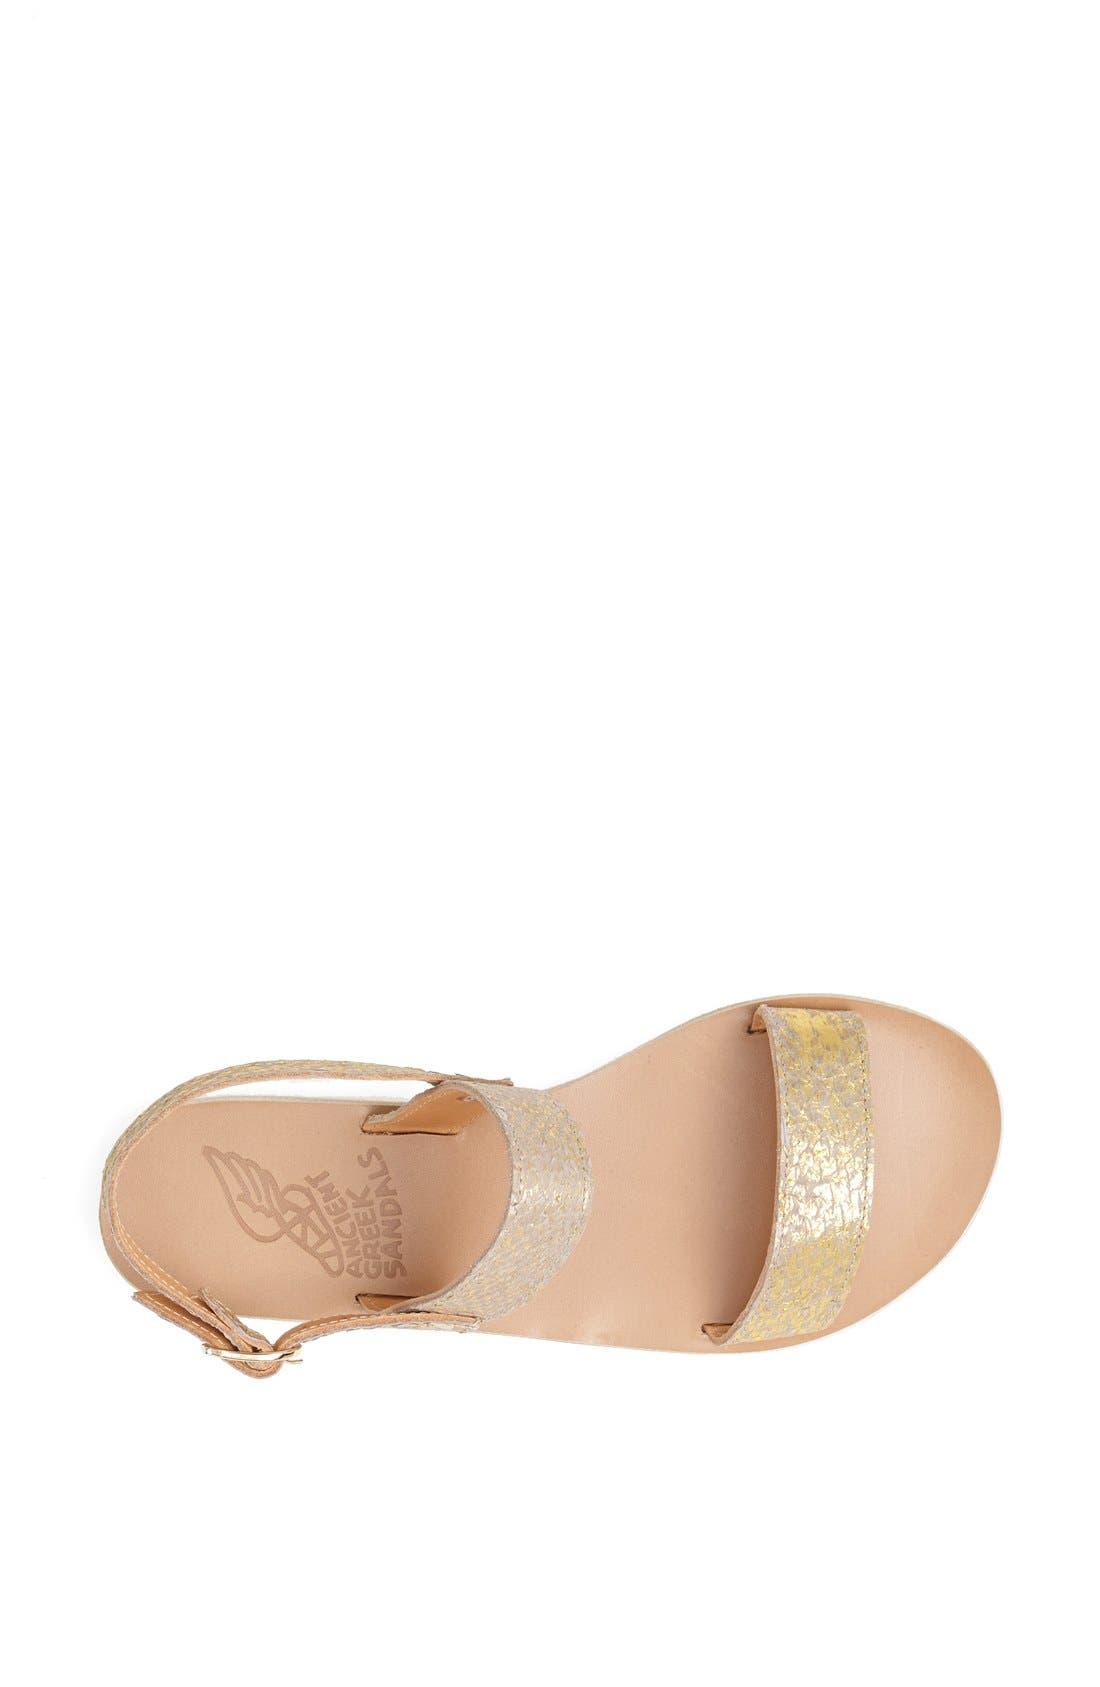 Alternate Image 3  - Ancient Greek Sandals 'Clio' Metallic Salmon Skin Sandal